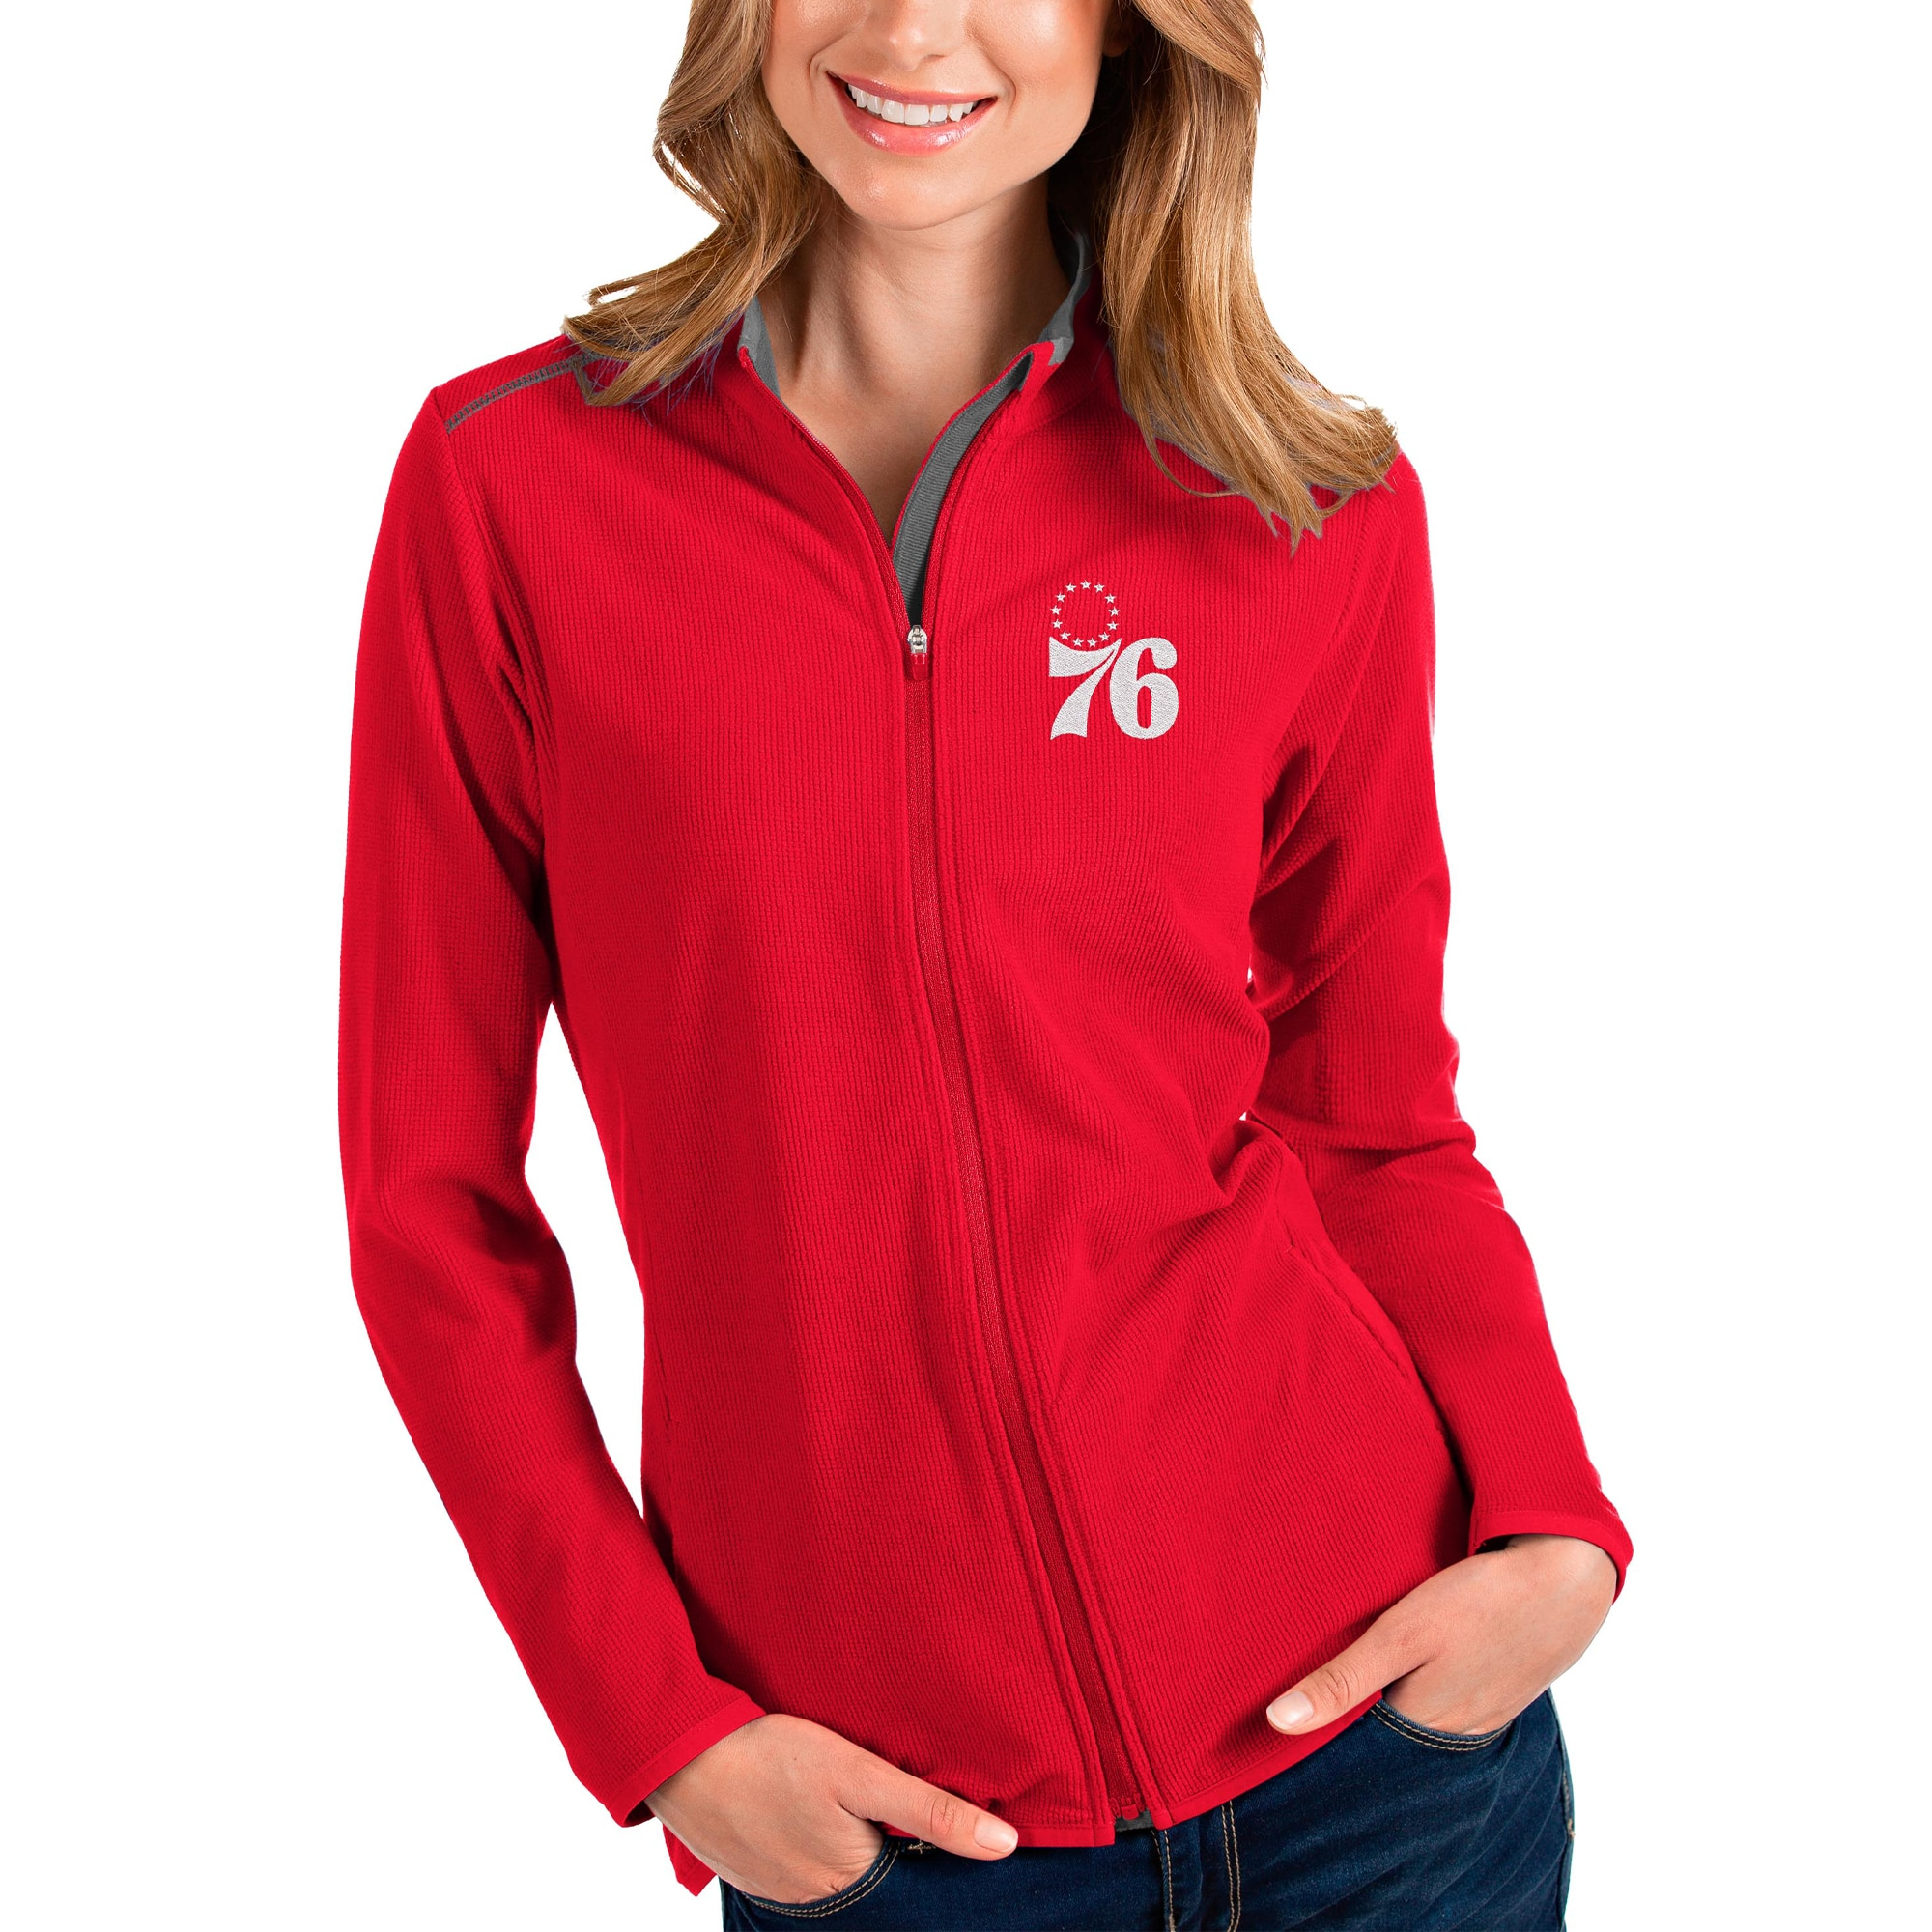 Philadelphia 76ers Antigua Women's Glacier Full-Zip Jacket - Red/Gray